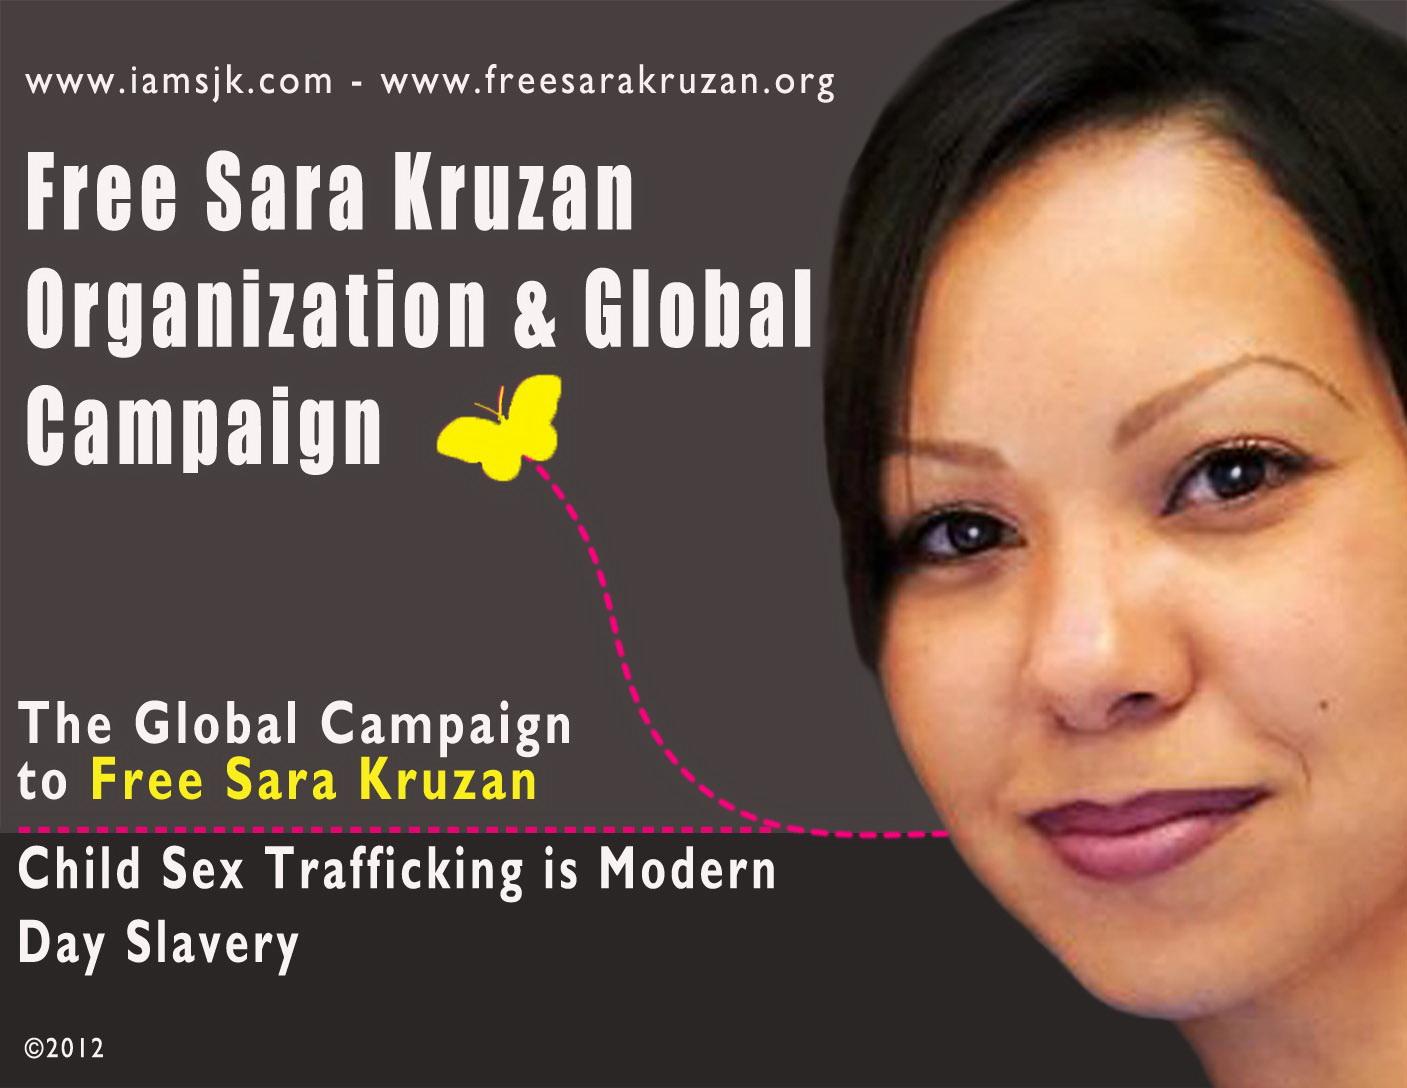 2012-10-17-Free_Sara_Kruzan_poster.jpg